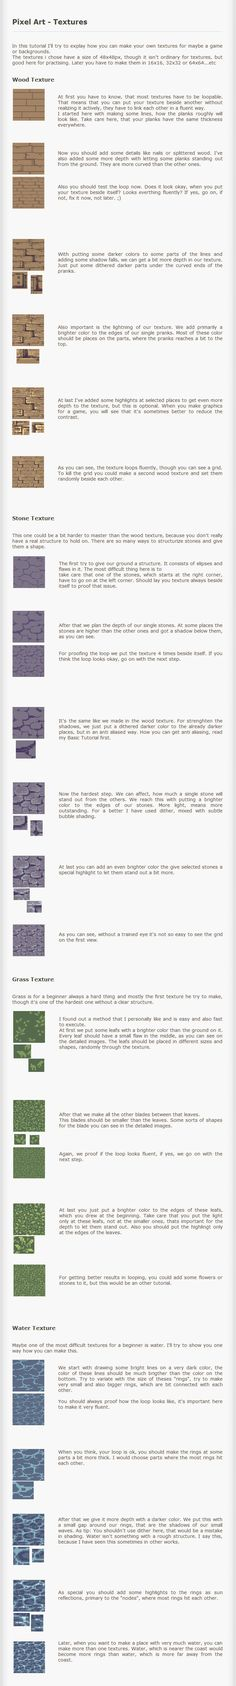 http://kiwinuptuo.deviantart.com/art/Pixel-Art-Tutorial-Textures-203459613: